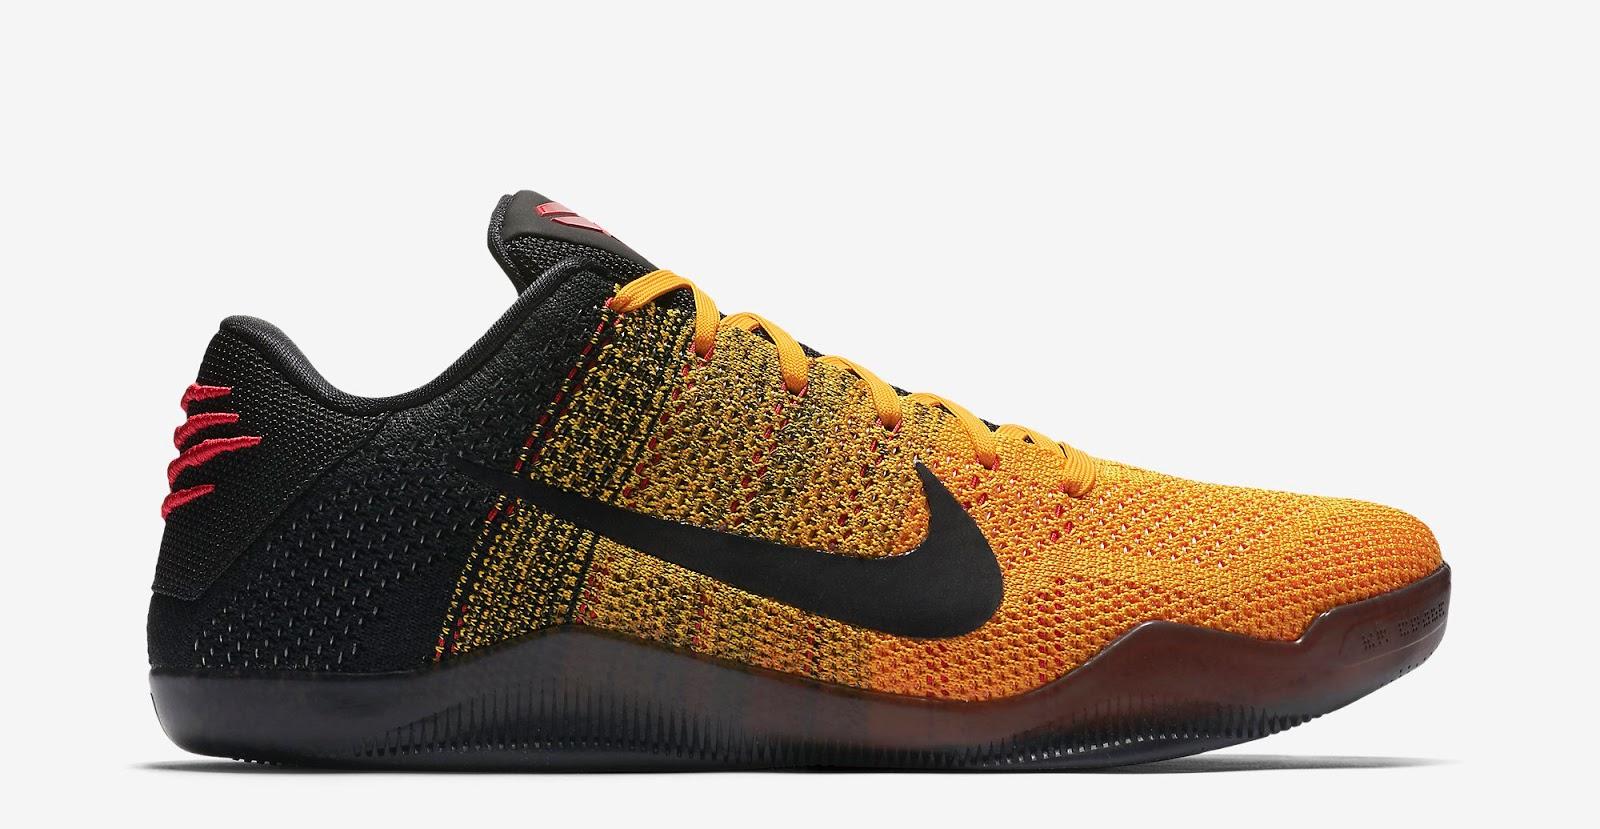 f4da94441bfa ajordanxi Your  1 Source For Sneaker Release Dates  Nike Kobe 11 ...